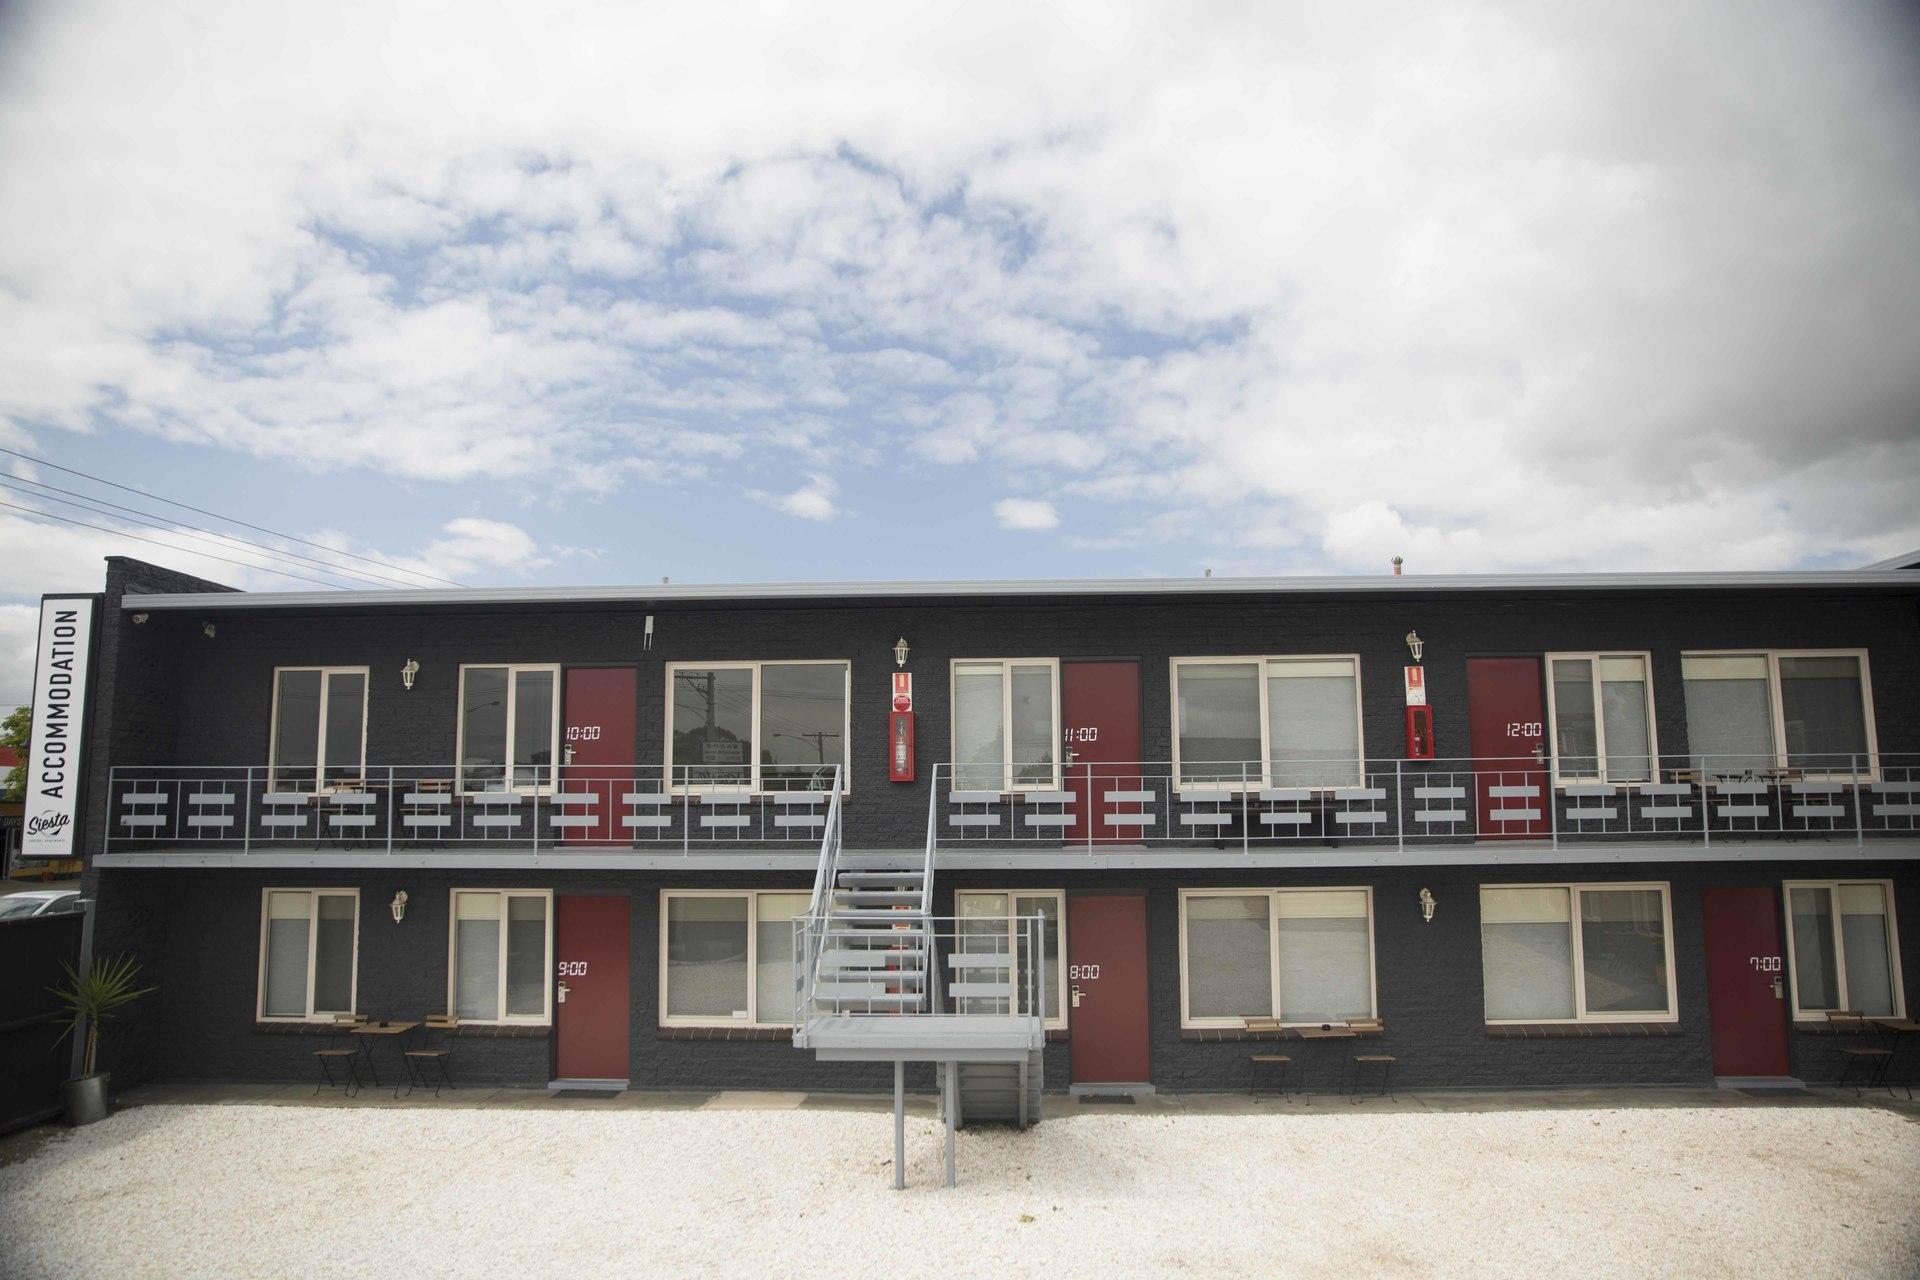 d - Siesta Central Apartments